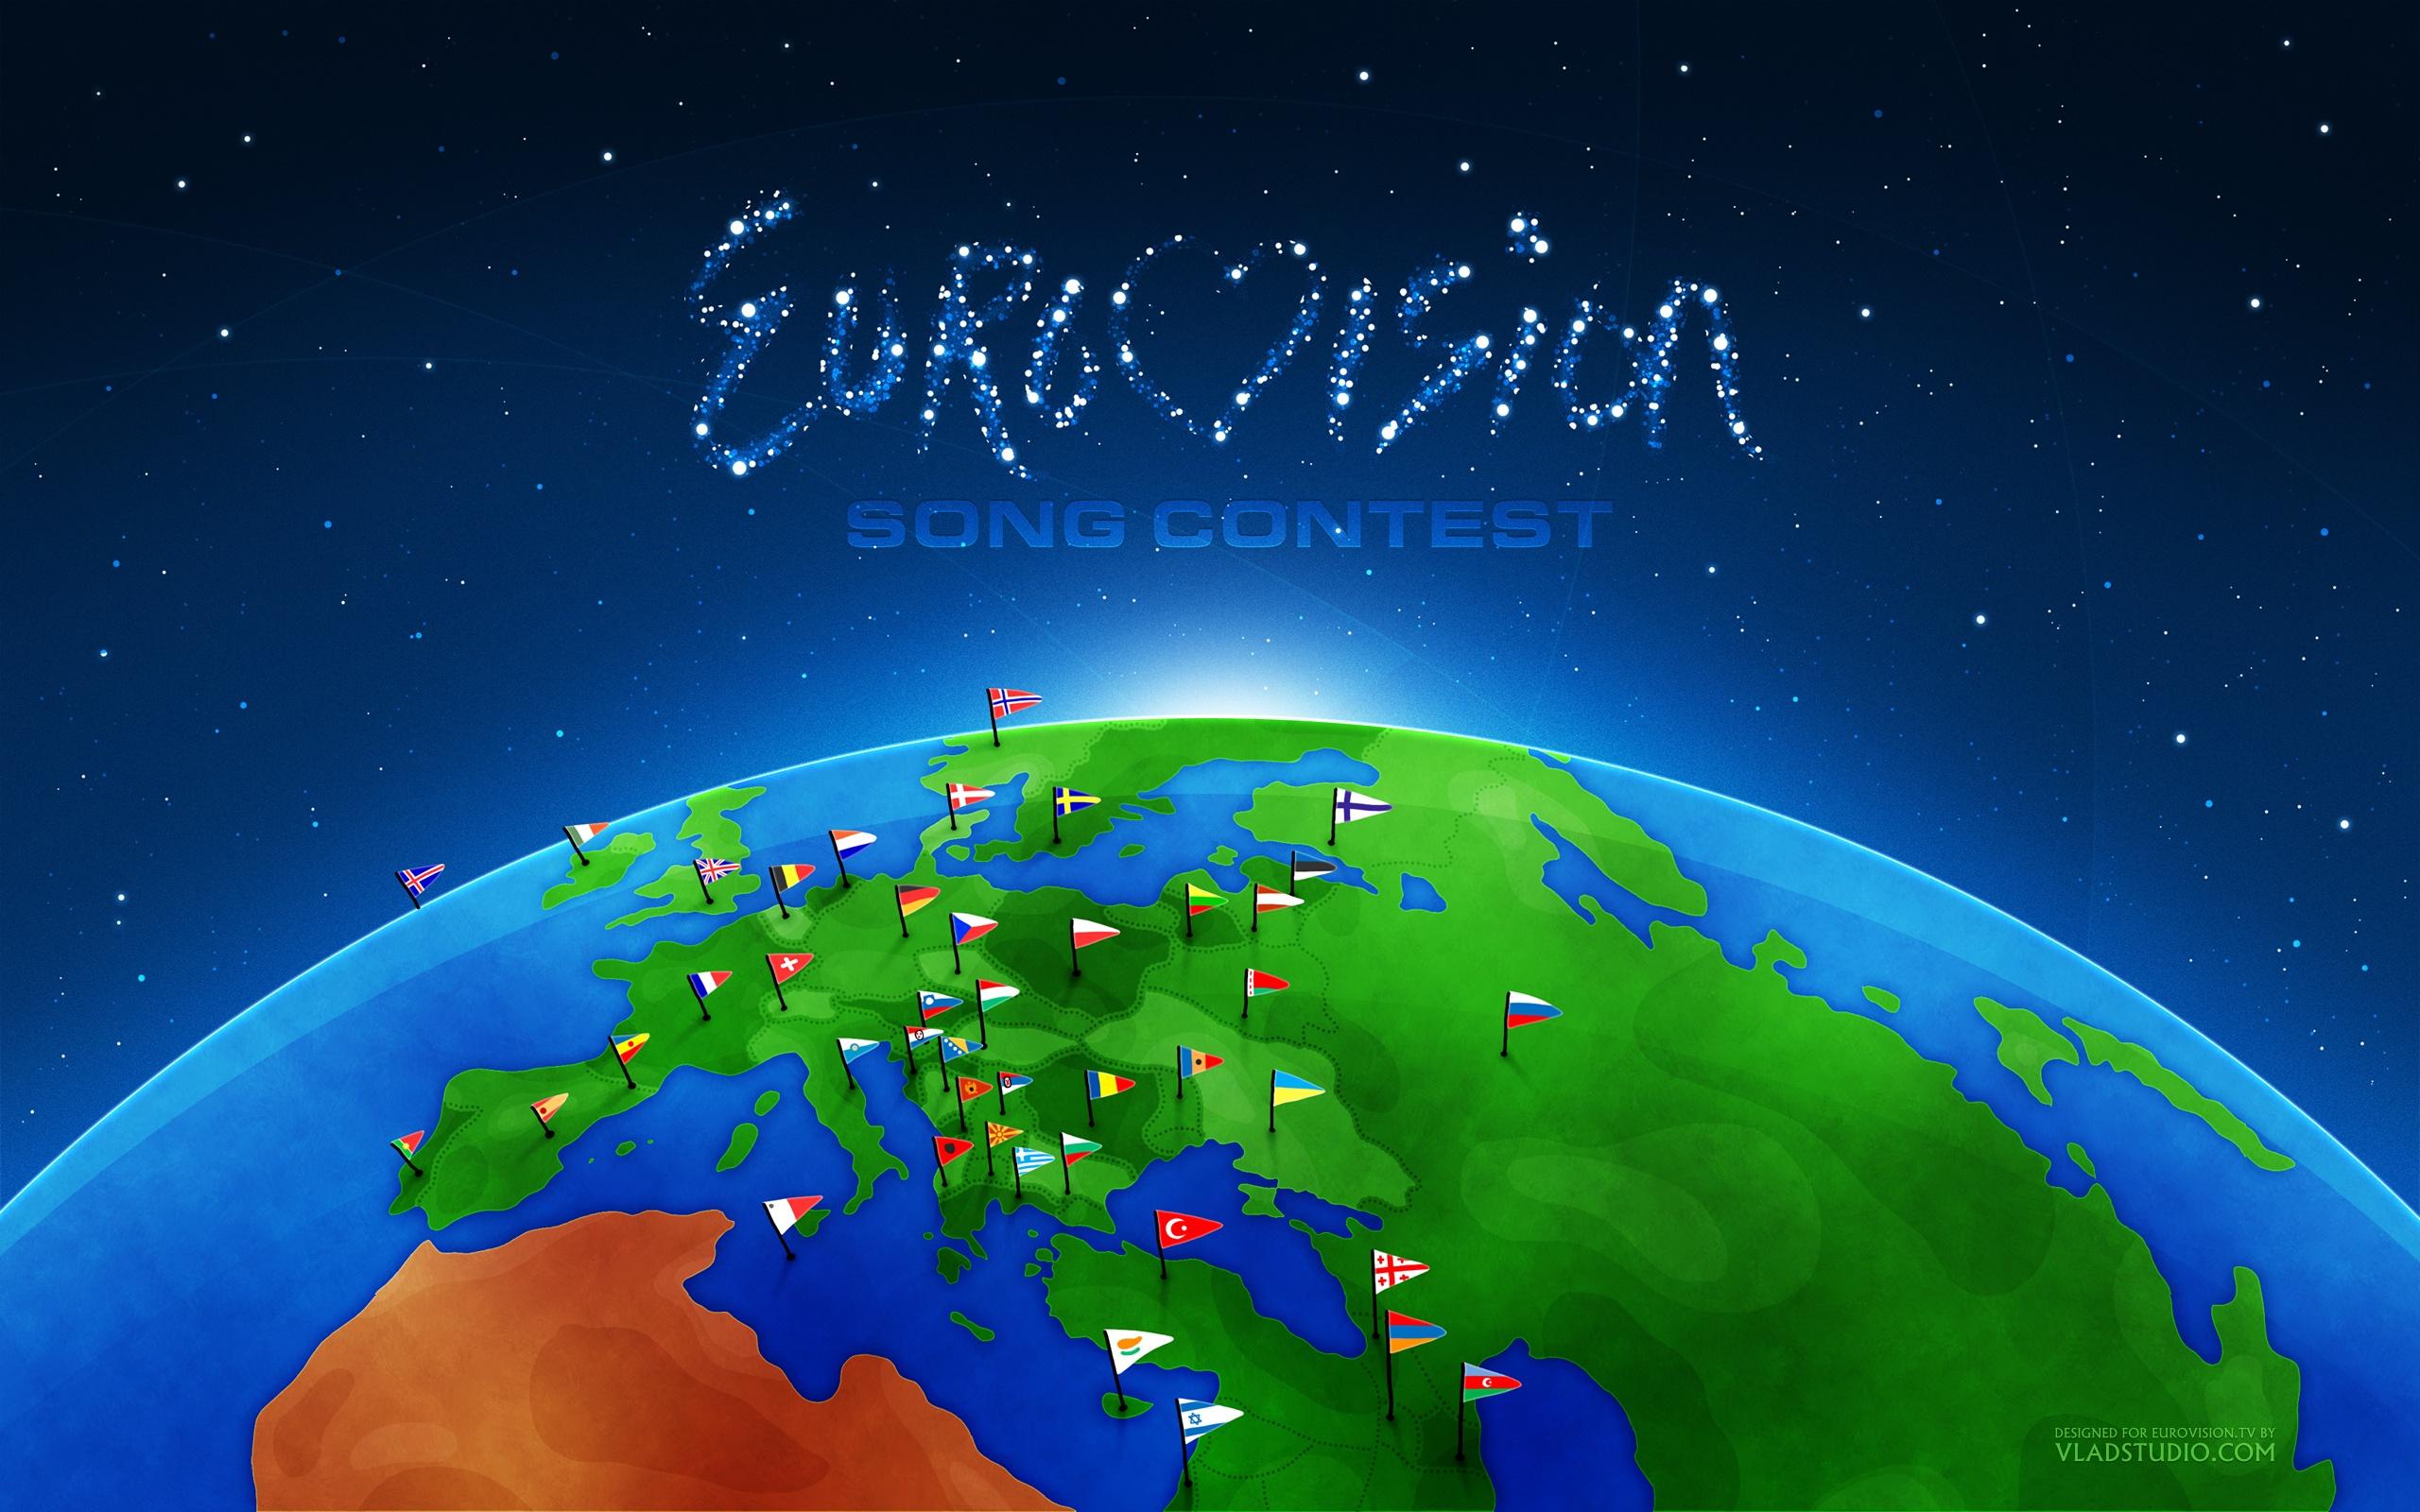 Песни евровидения 2009